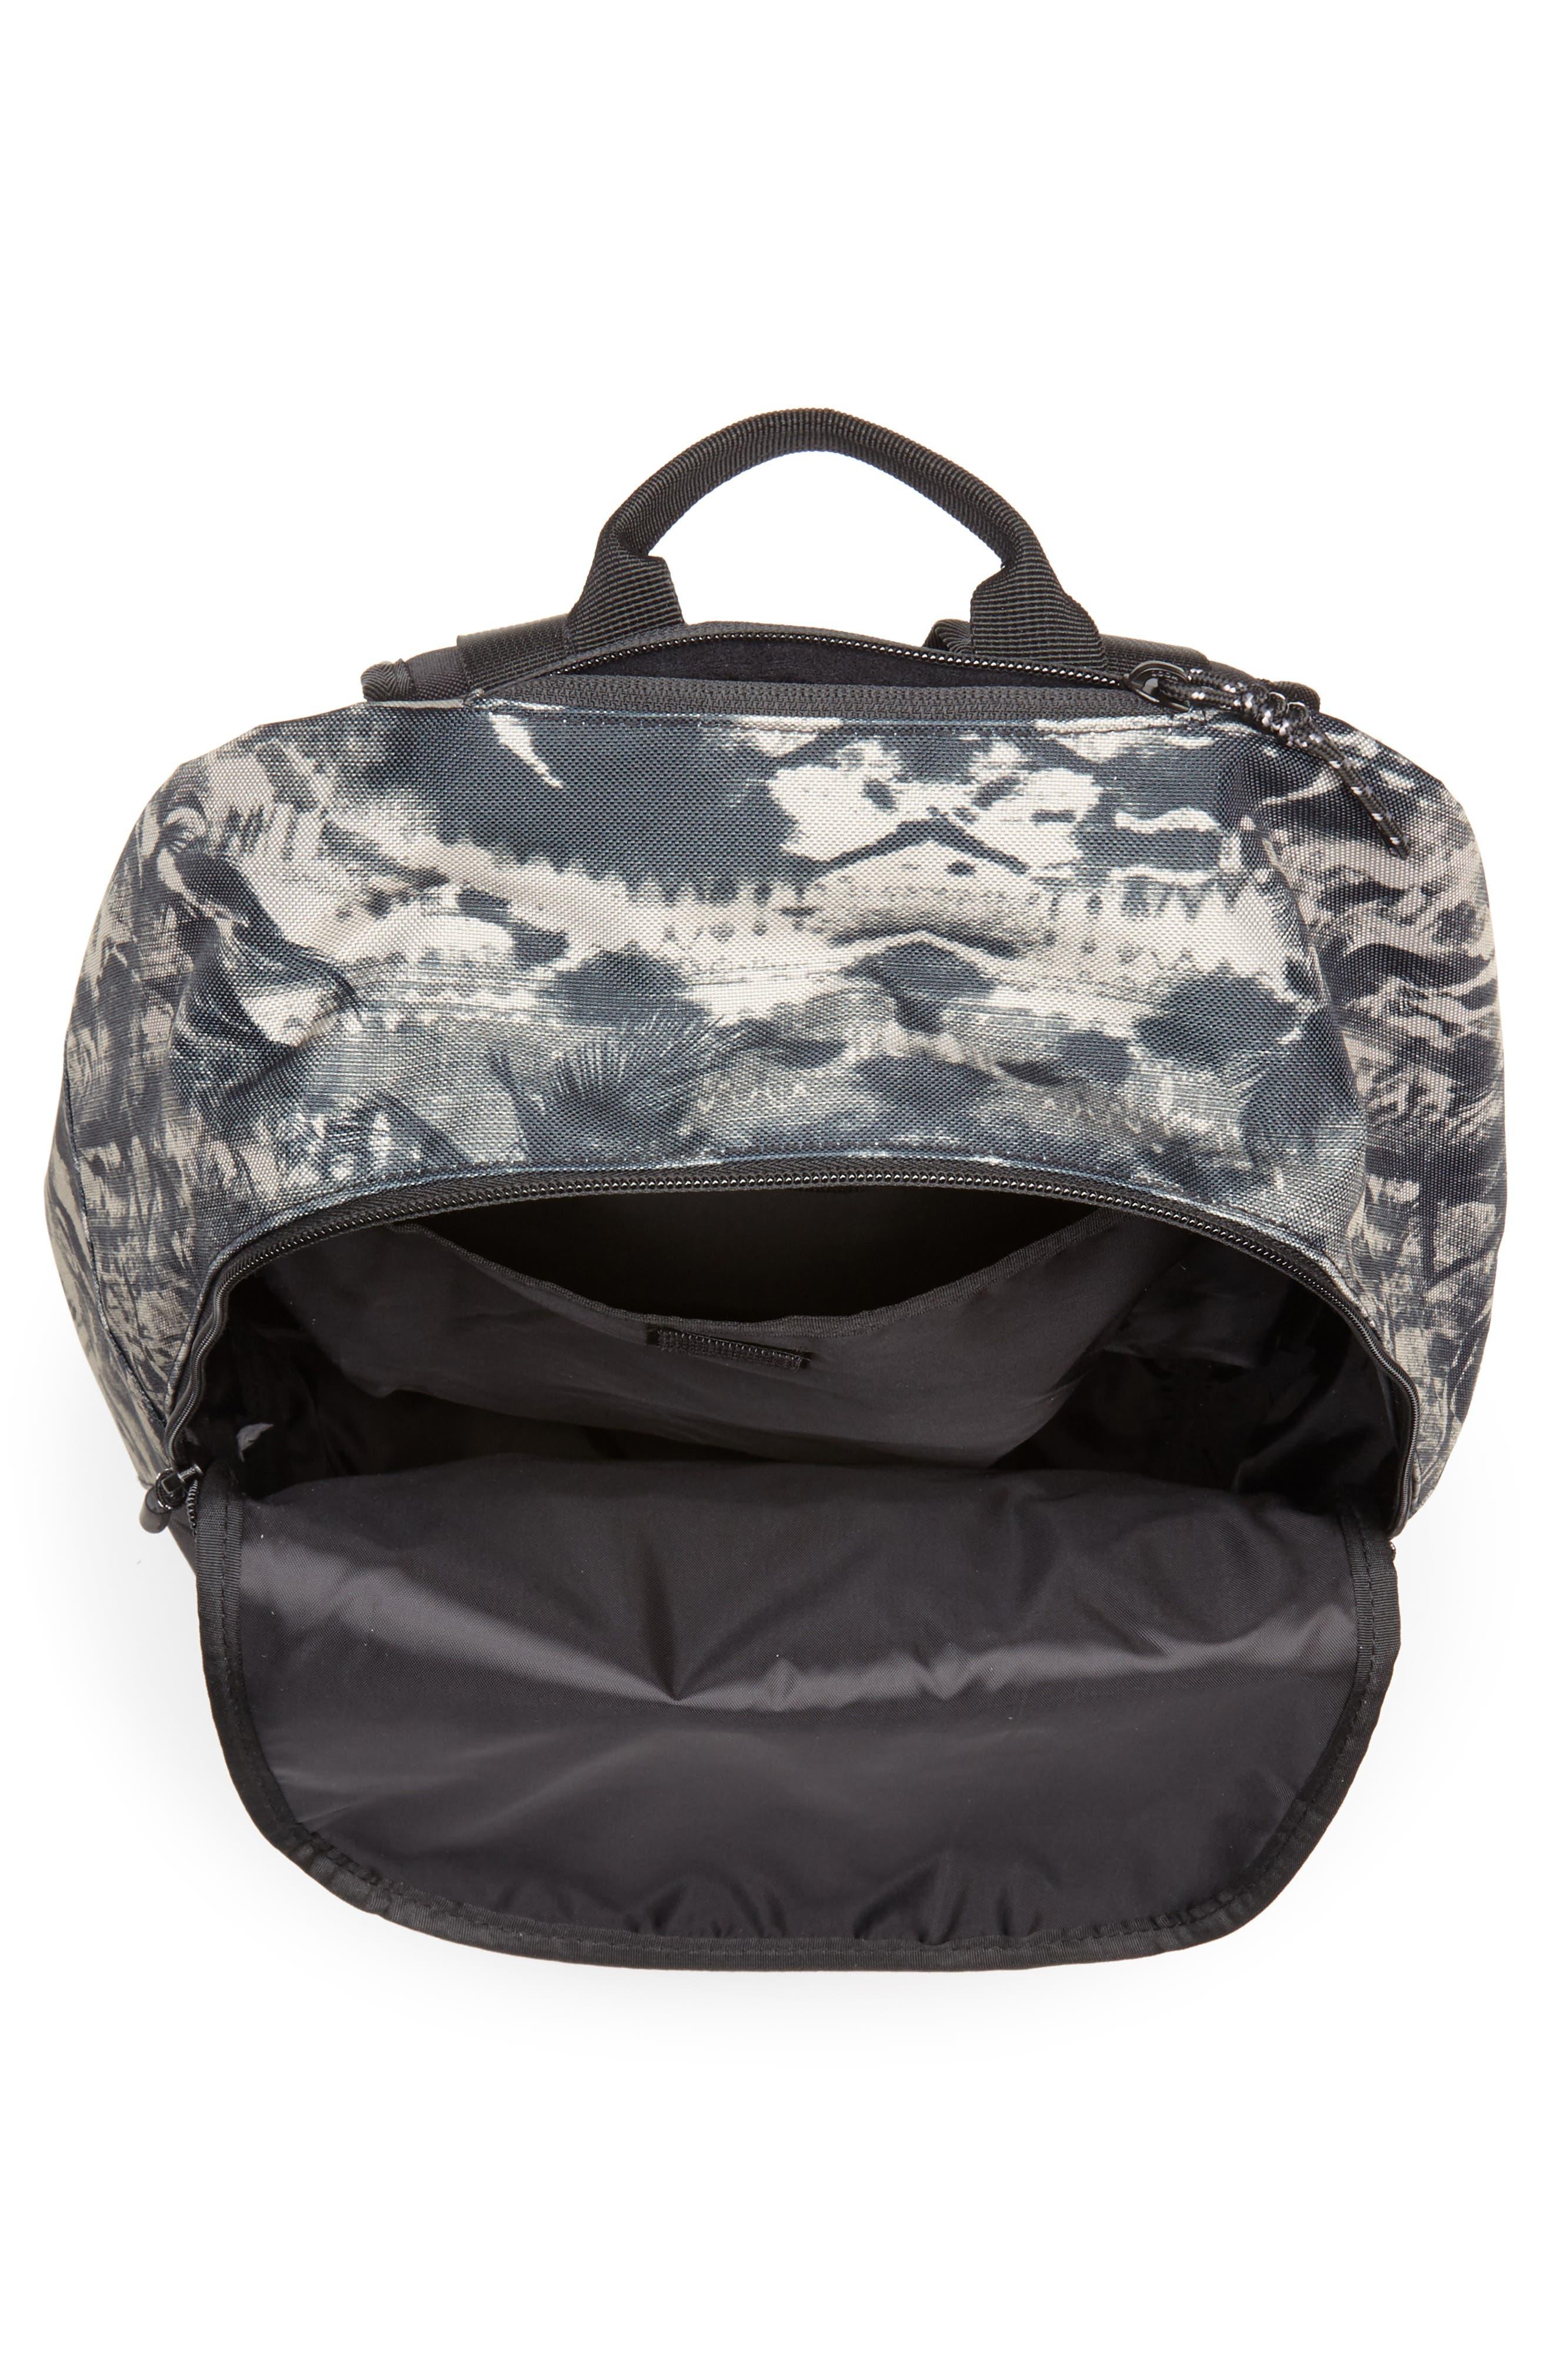 Transfer Backpack,                             Alternate thumbnail 4, color,                             DARK ARMY